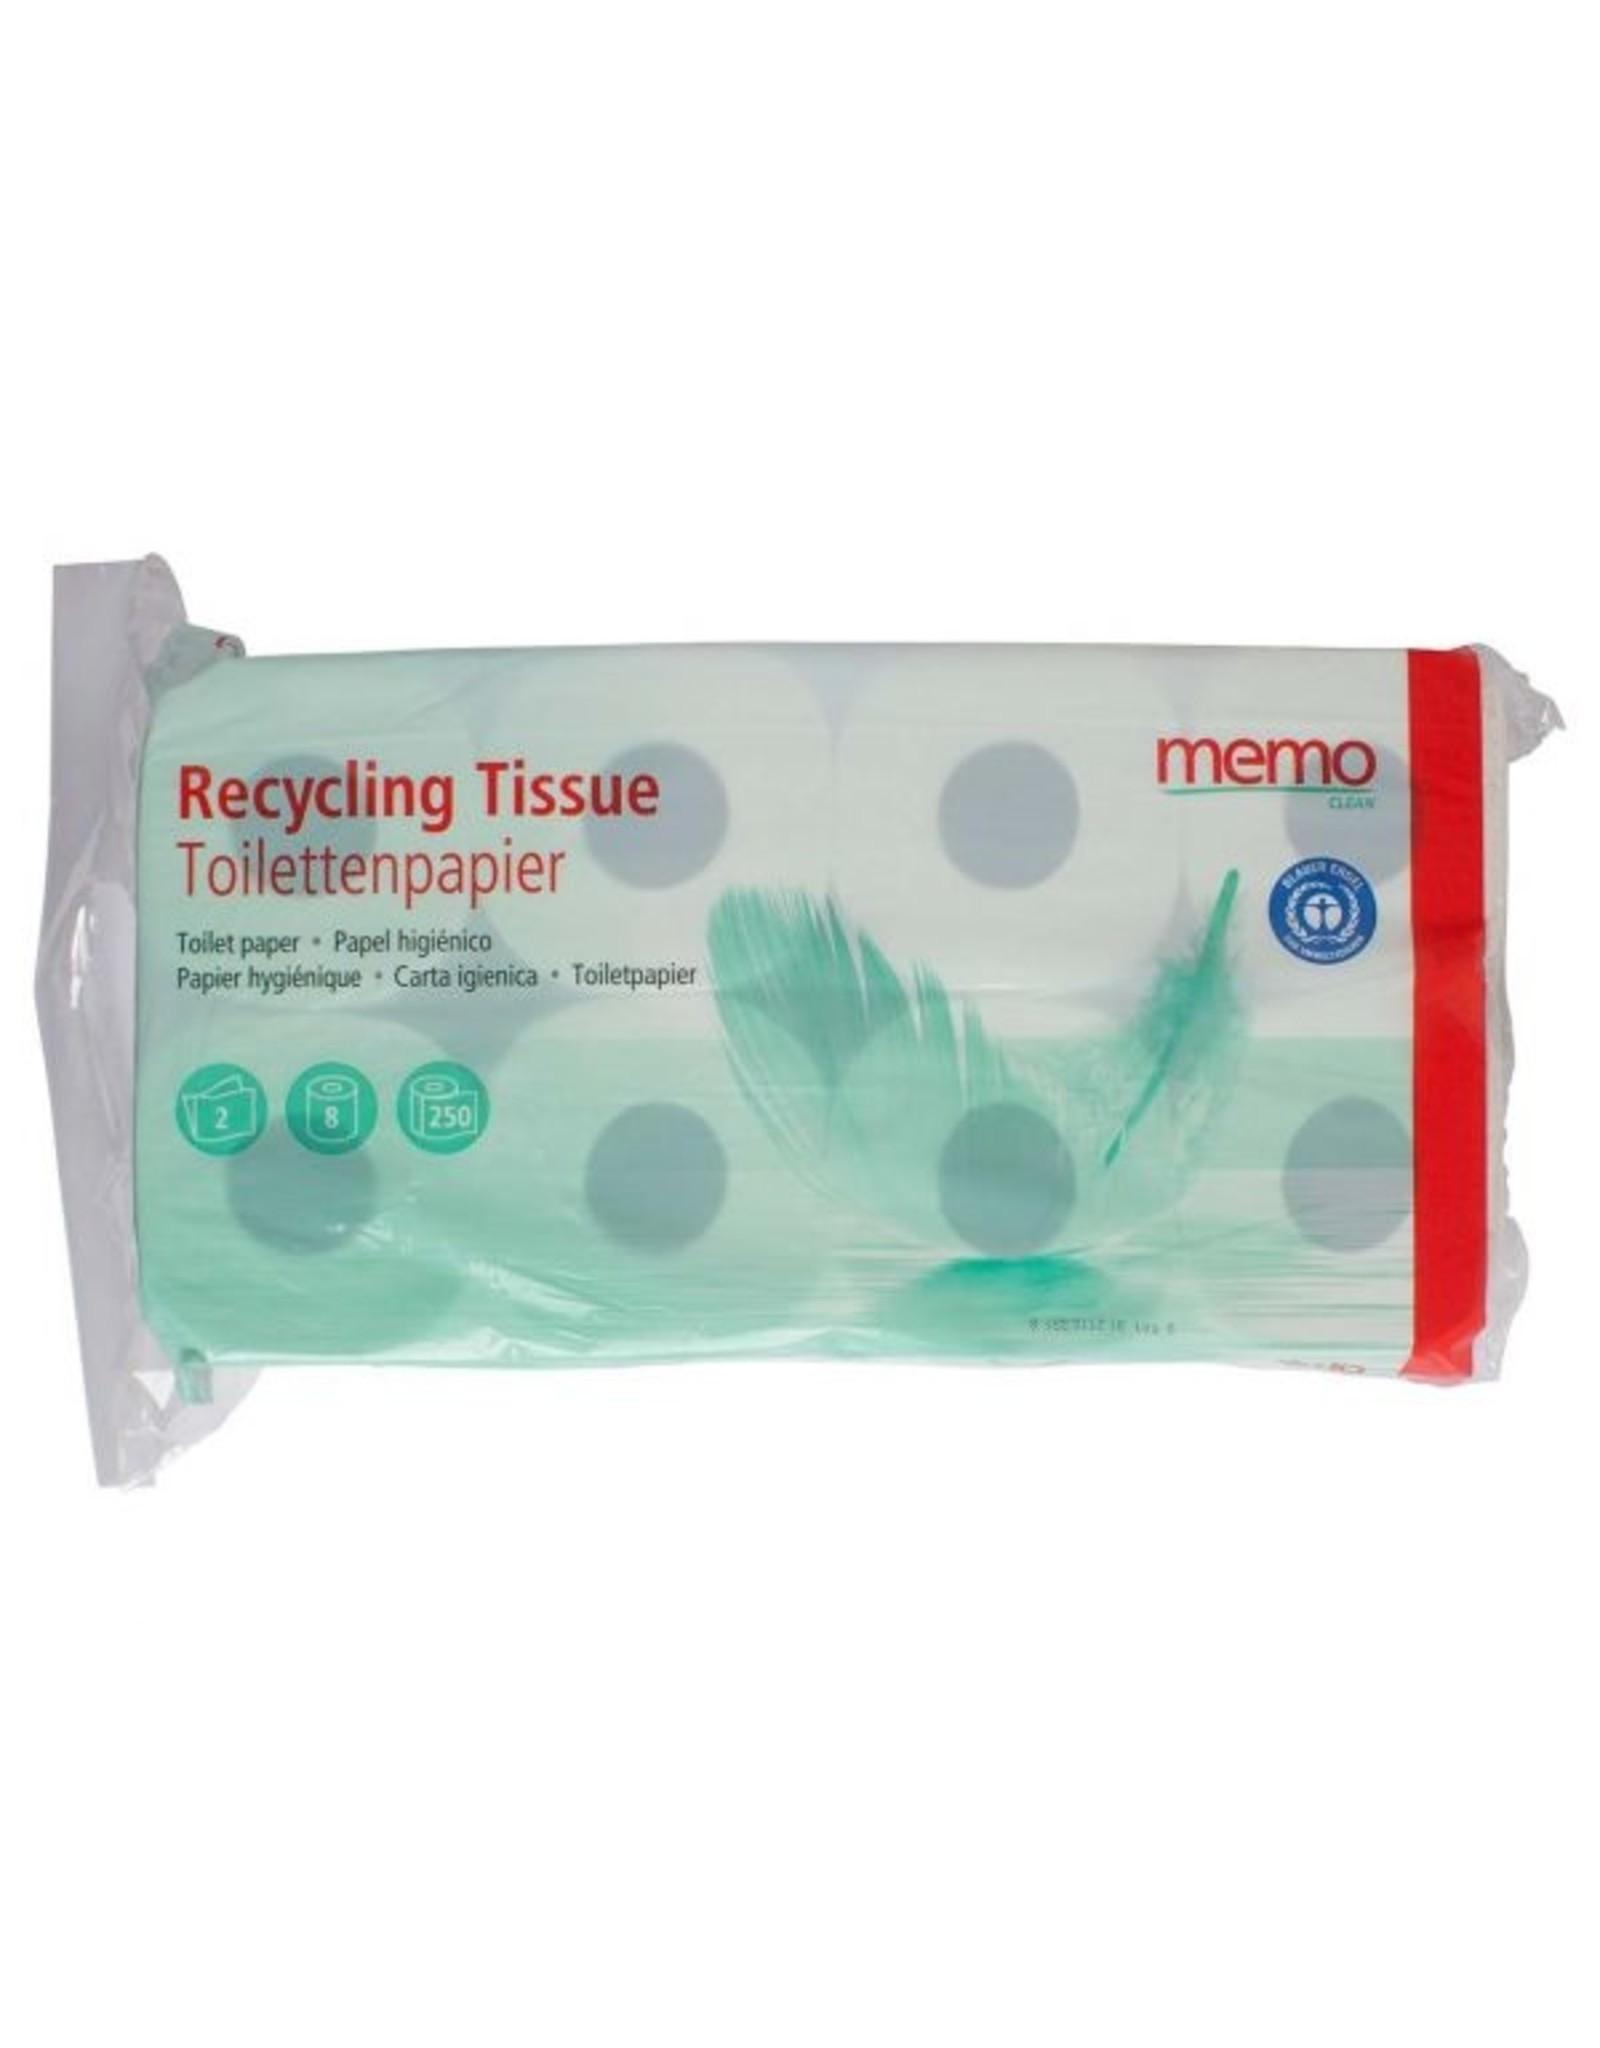 "memo Toilettenpapier ""Recycling Tissue"" 2-lagig"